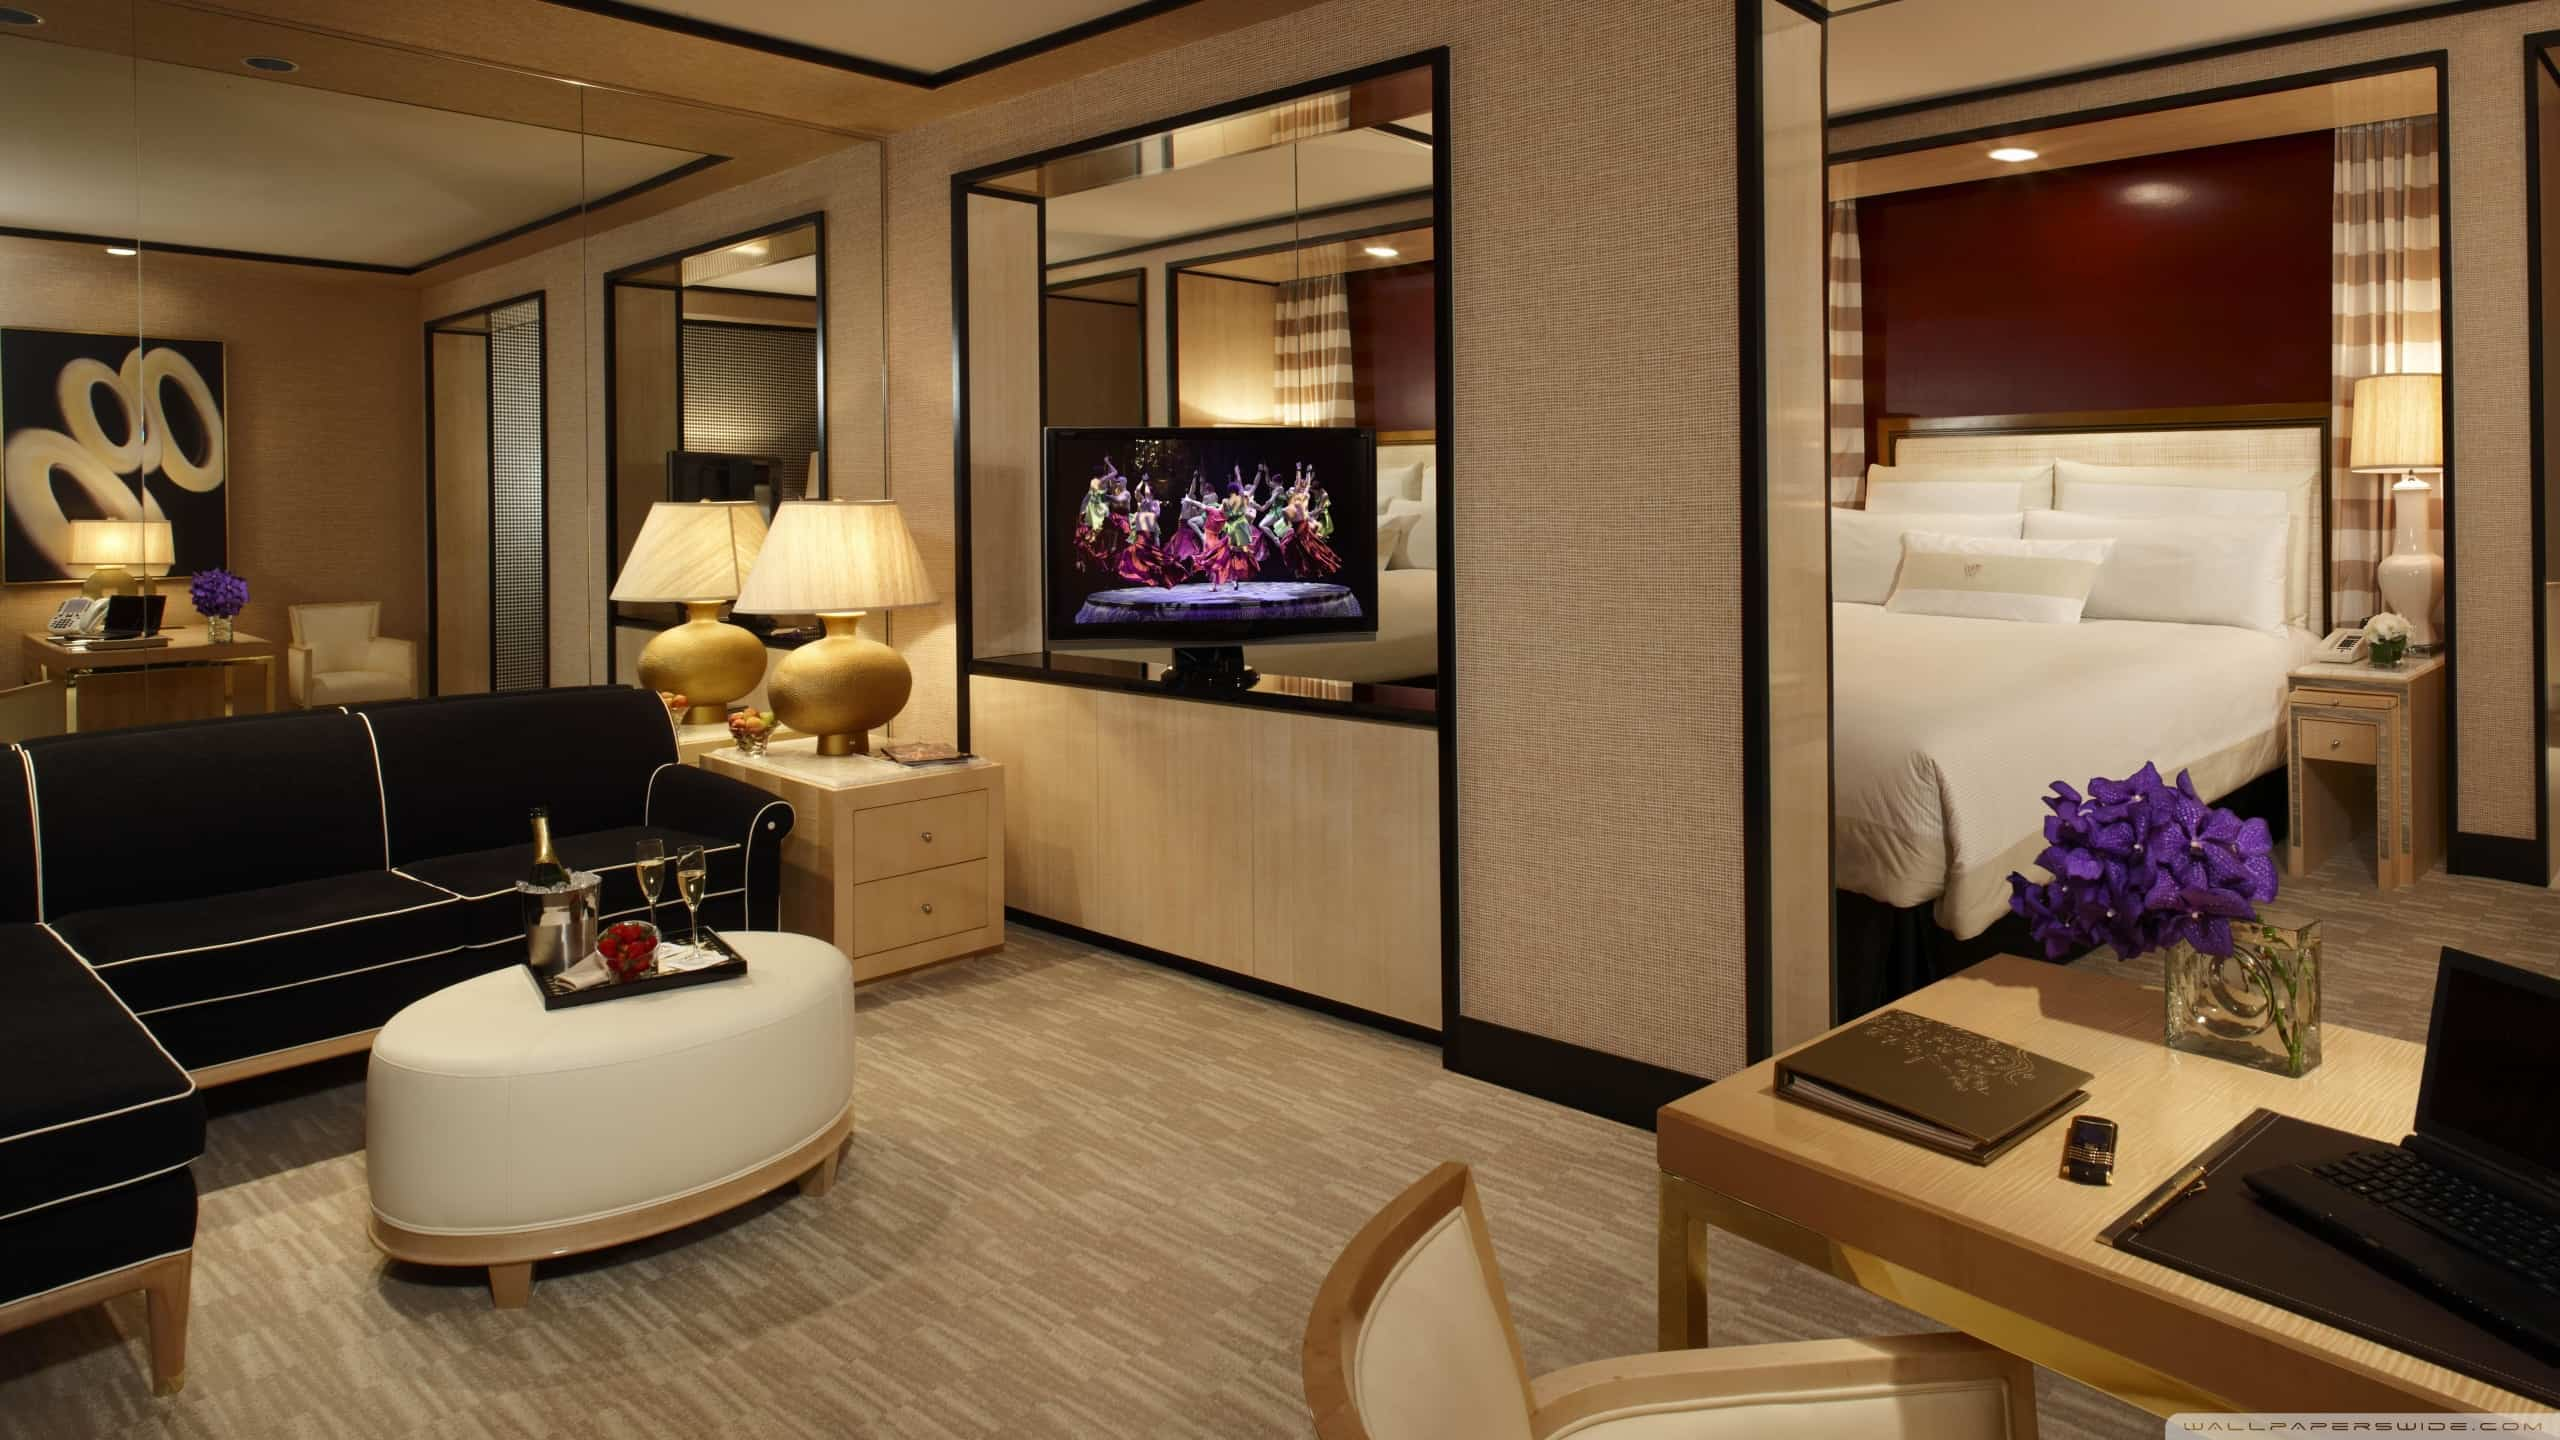 Hotel Wallpaper for Commercial Interior Design   Wallscape 2560x1440